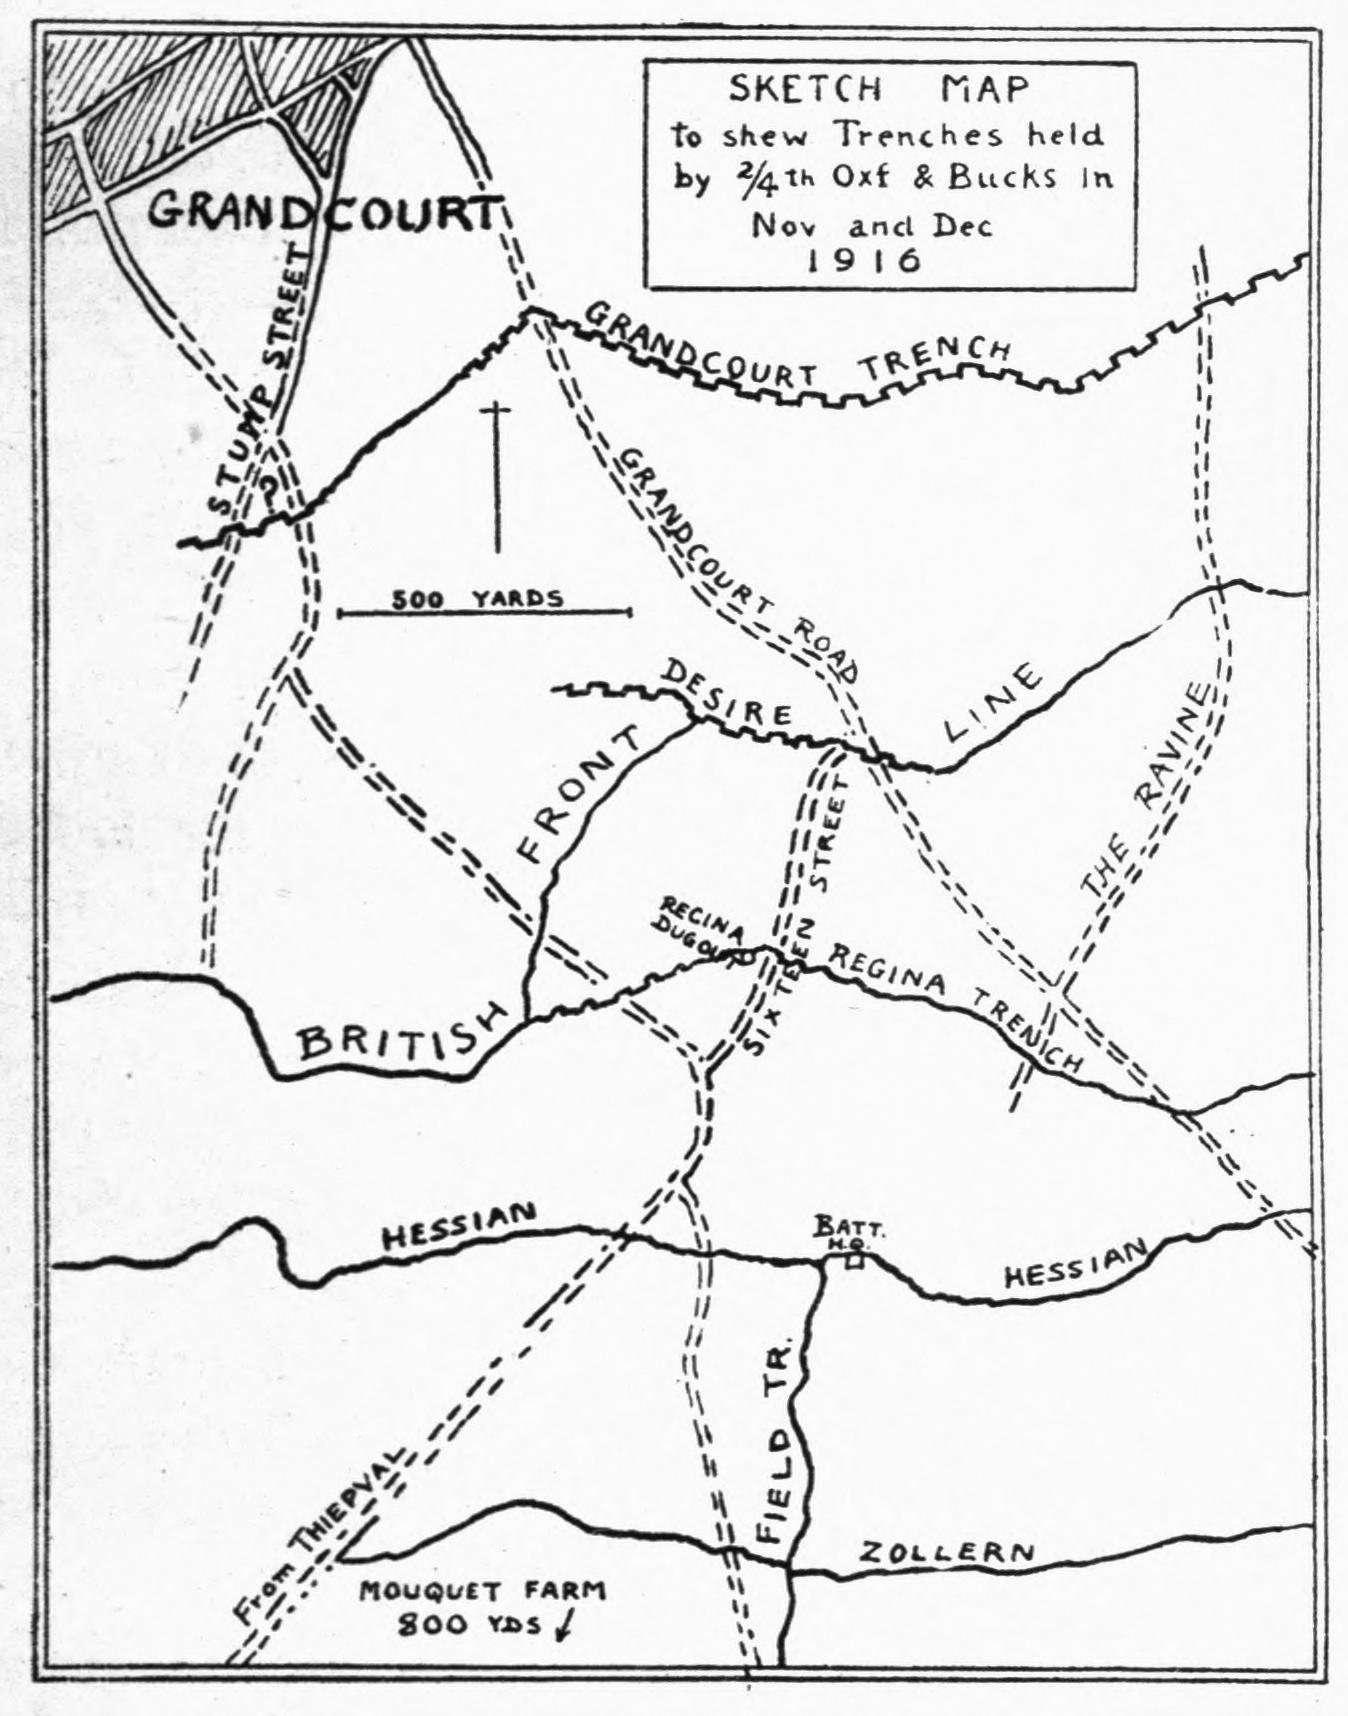 trenches-near-grandcourt-nov-dec-1916.jpg